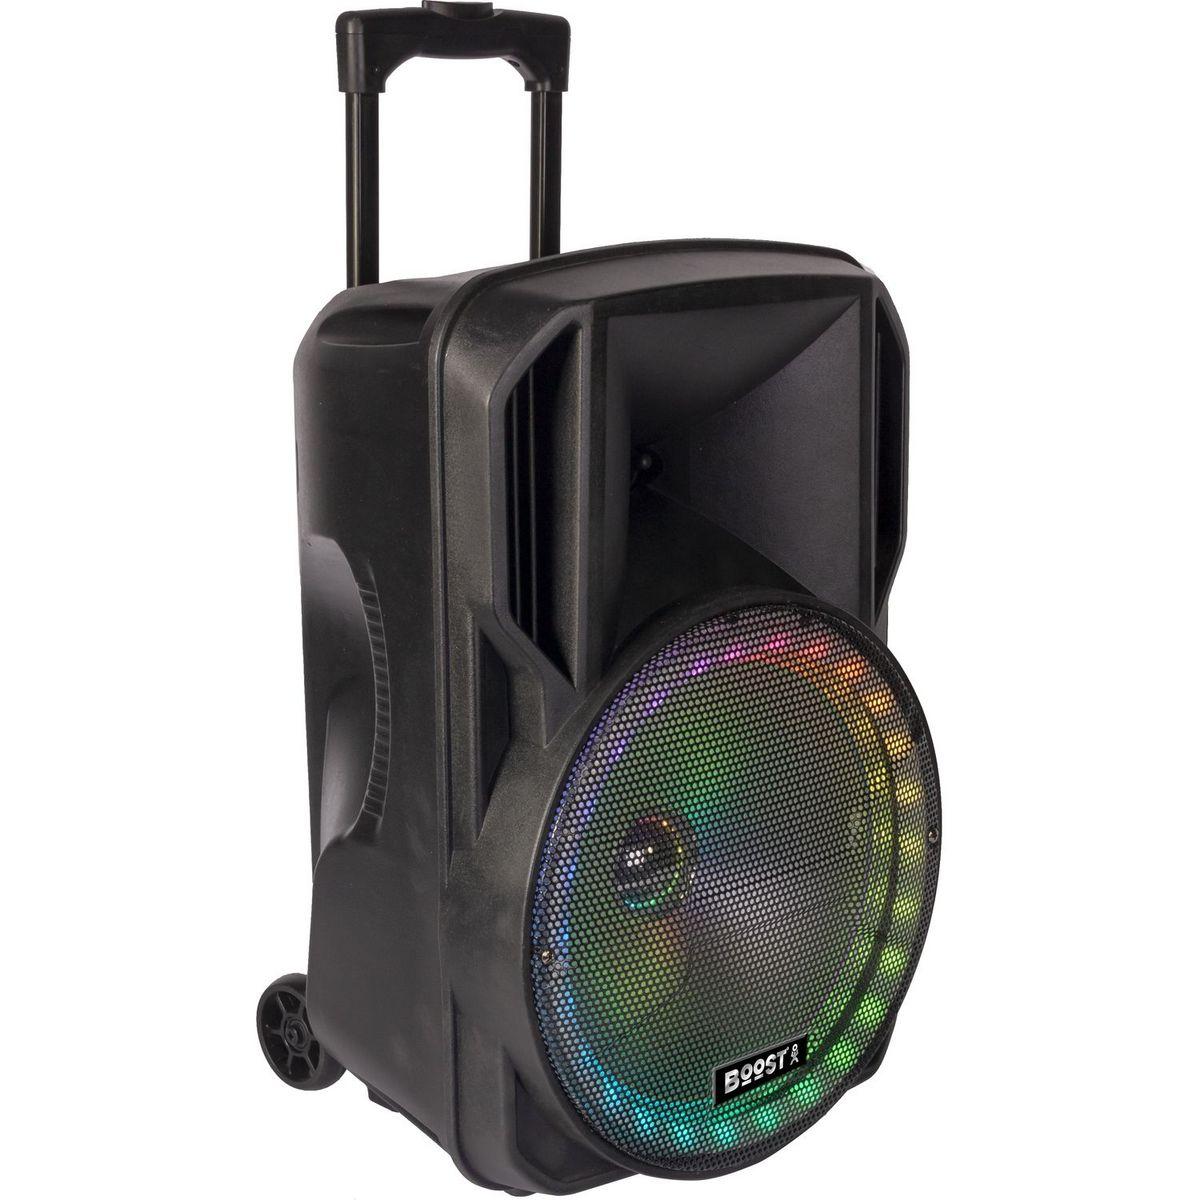 Enceinte portable Bluetooth - Noir - 12RGB-700